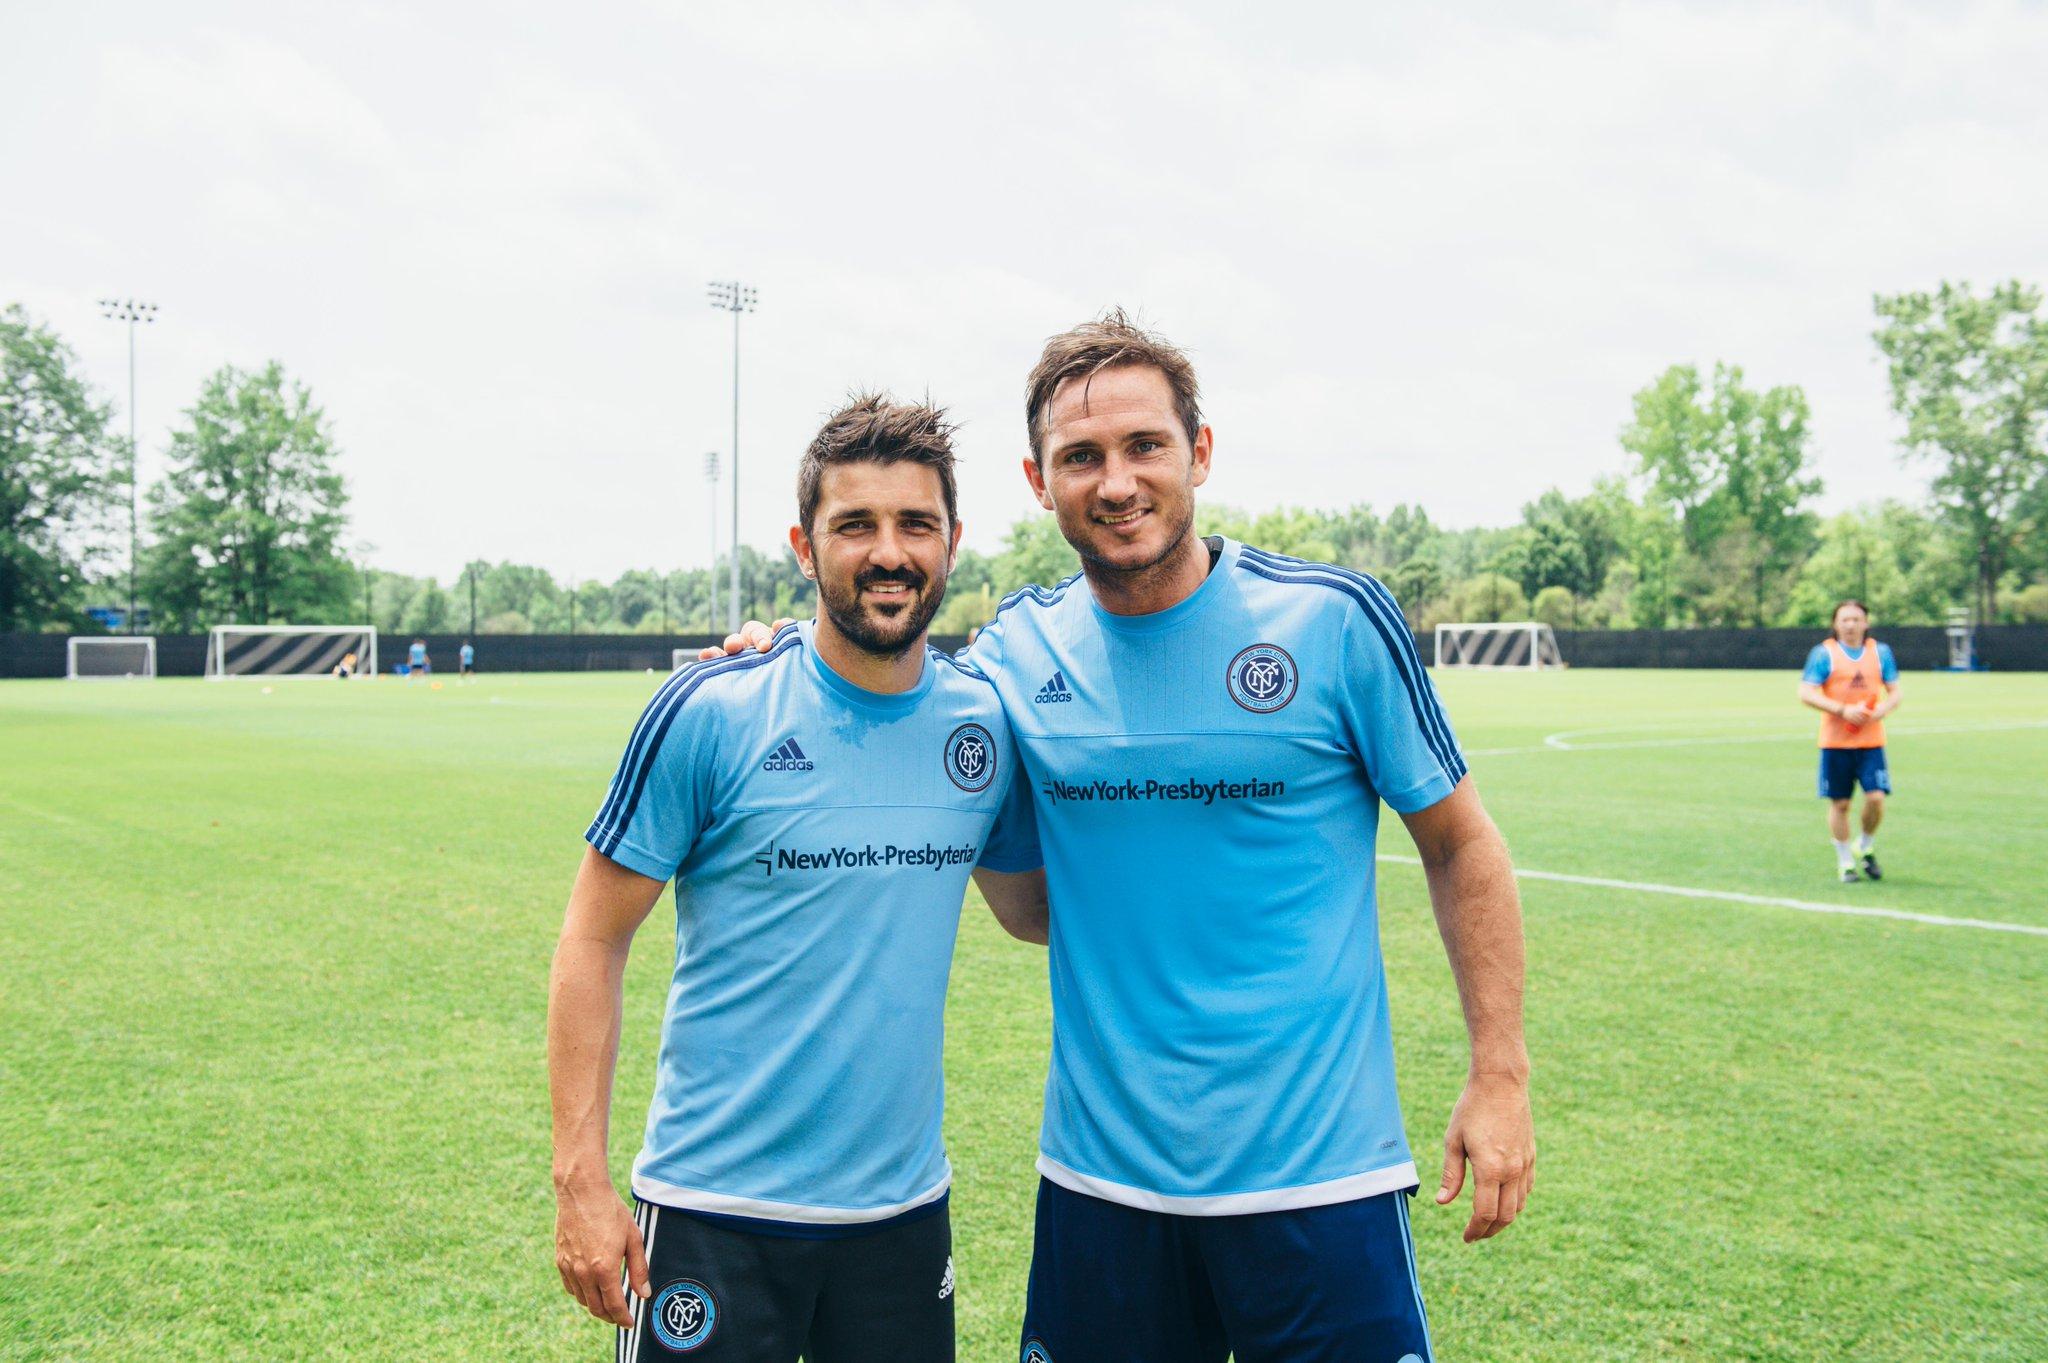 RT @NYCFC: .@Guaje7Villa and Frank Lampard #NYCFC http://t.co/VhIALDNpMF